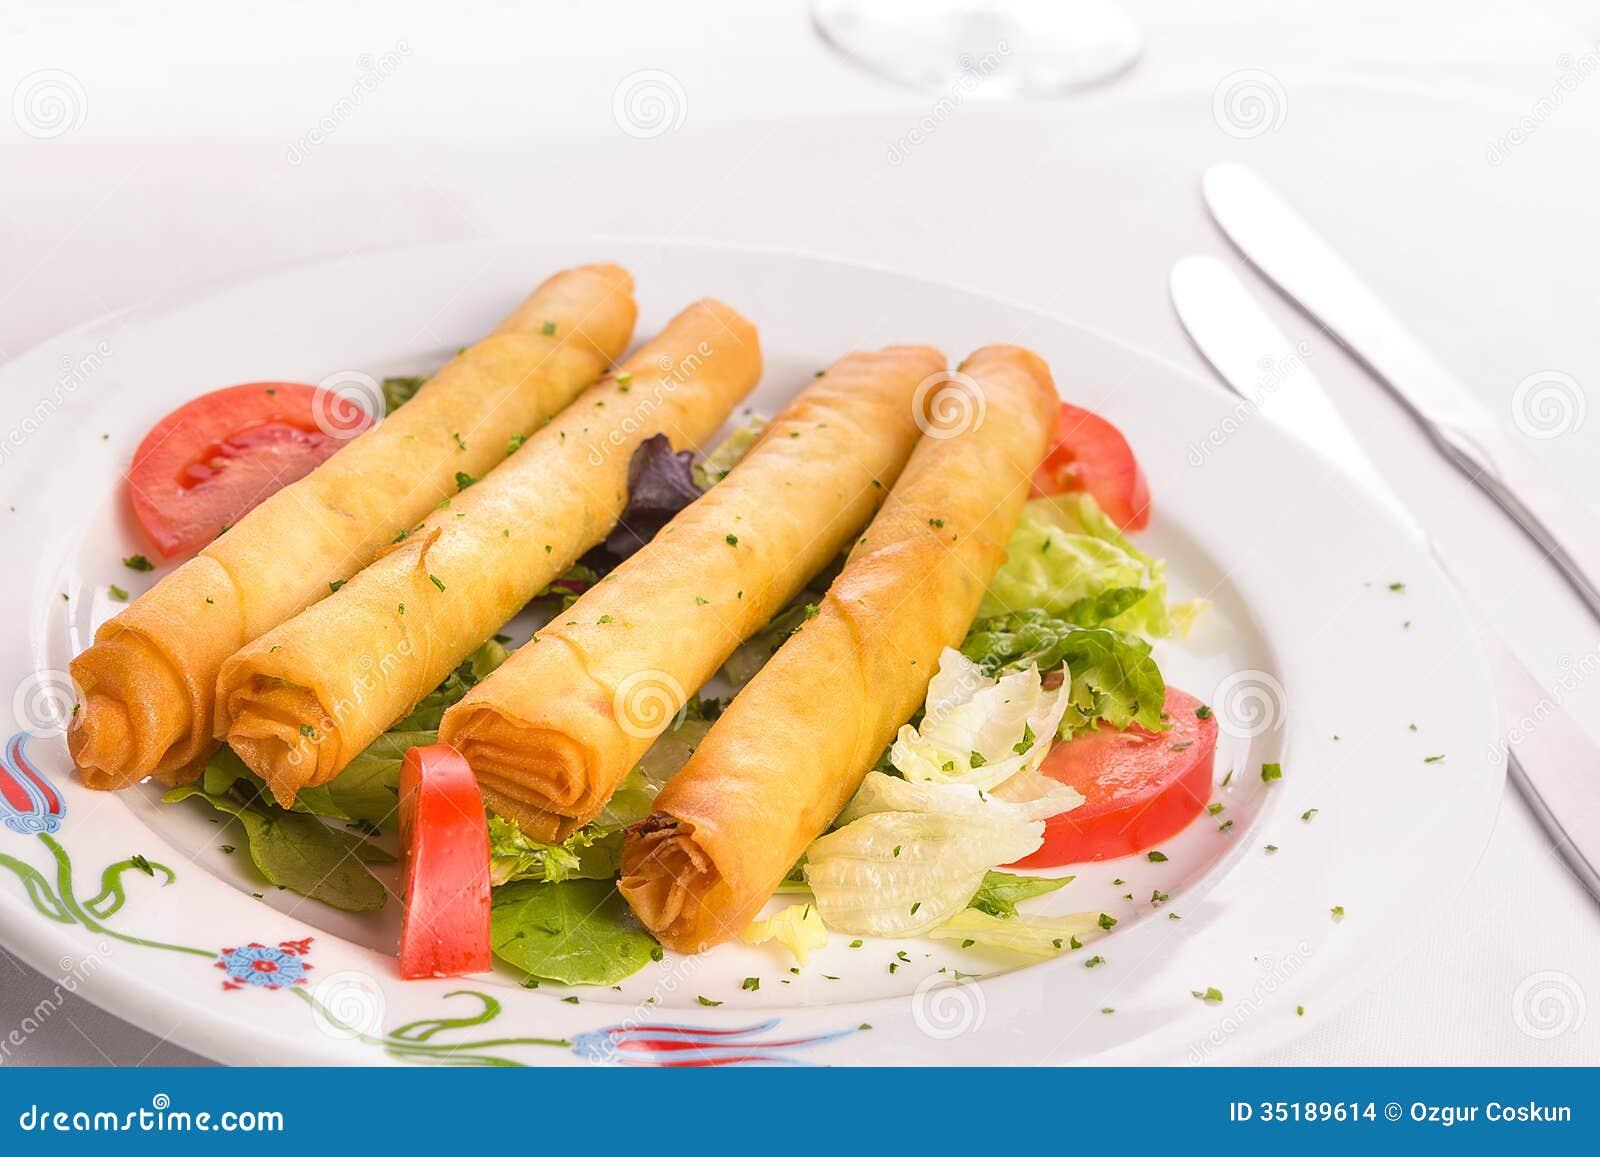 Turkish Fried Sigara Borek Served With Vegetables Stock Images - Image ...